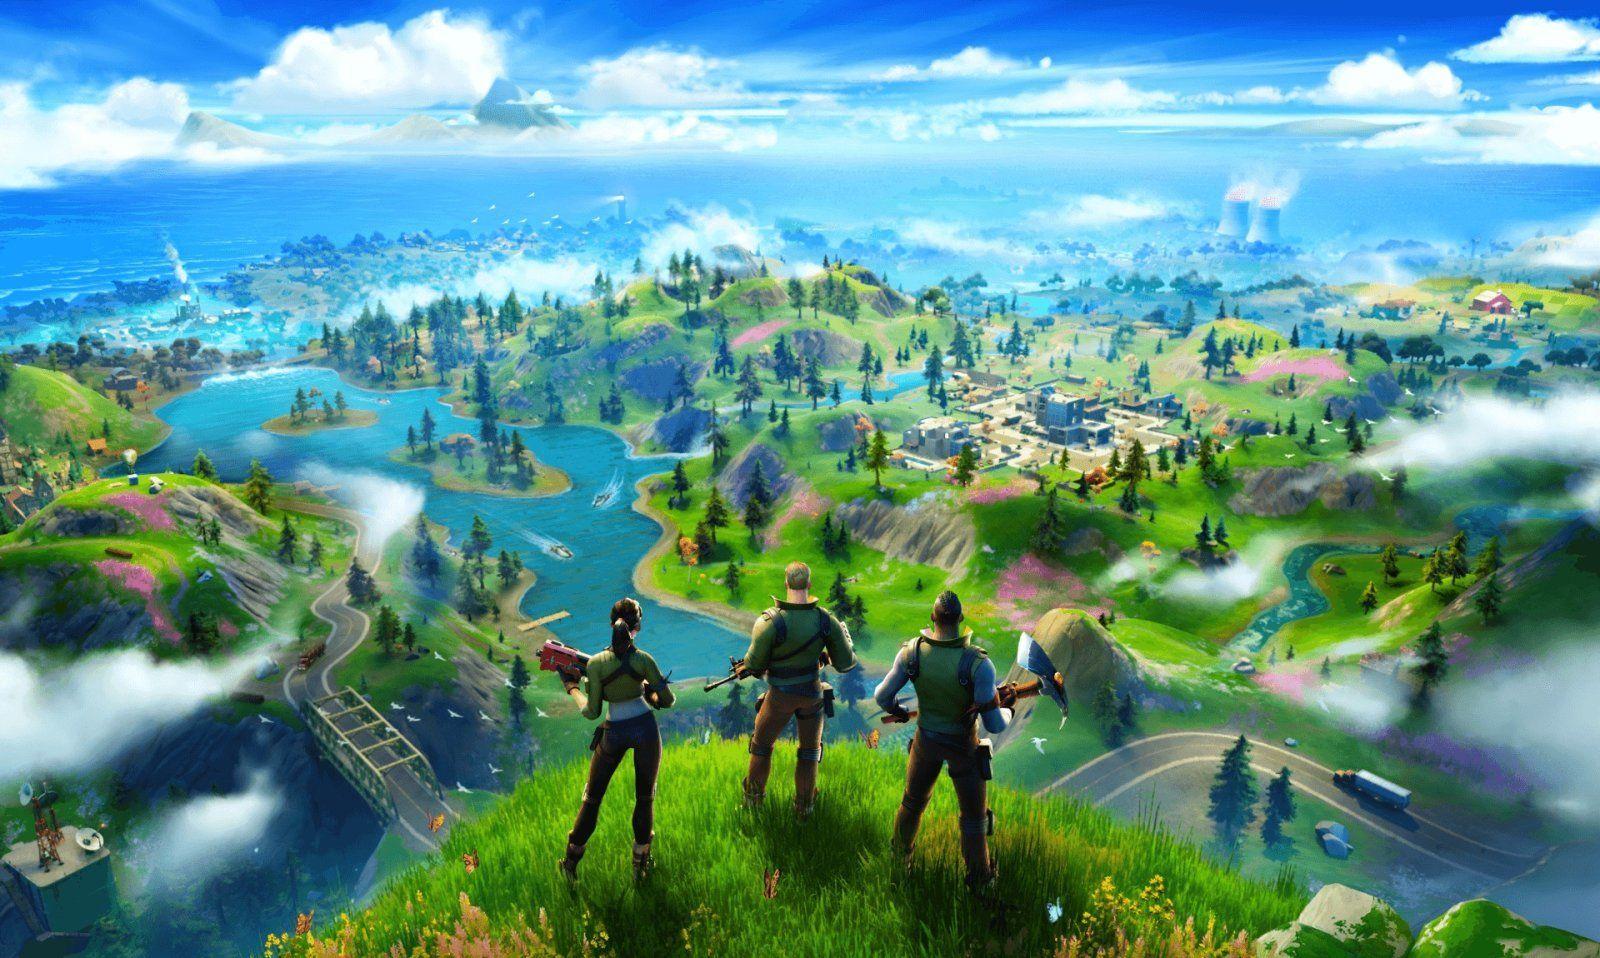 Fortnite Epic Games avis Tfue smg AR